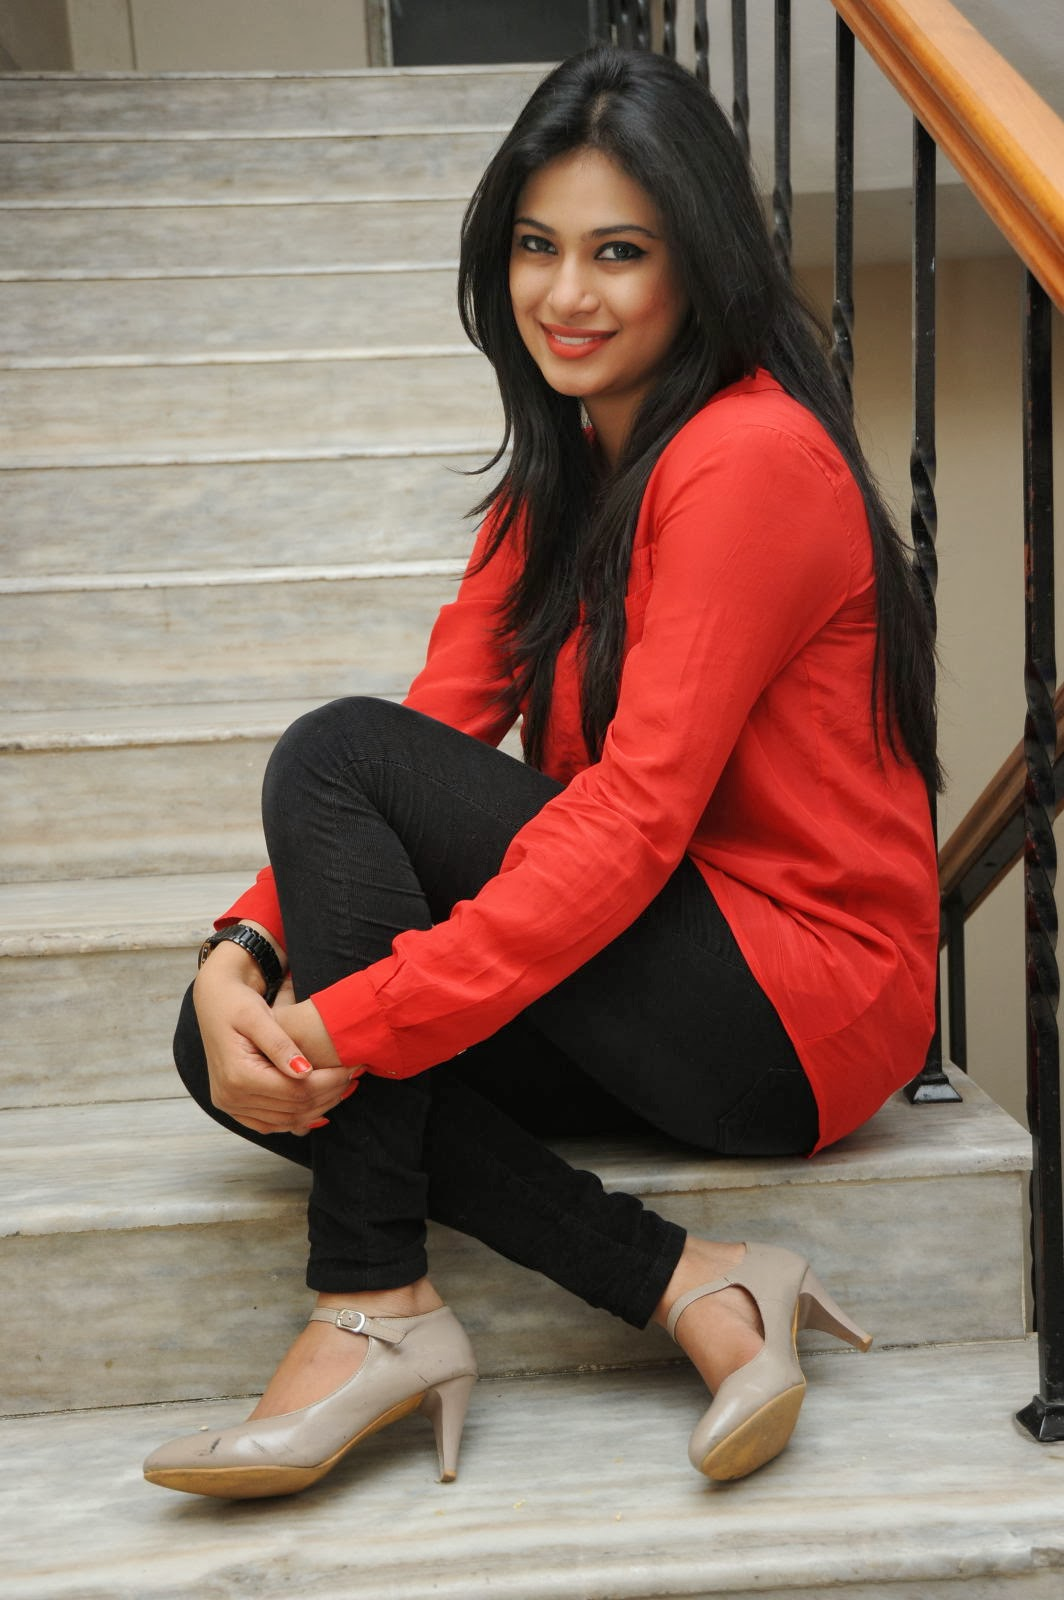 Zara Shah hot in red dress